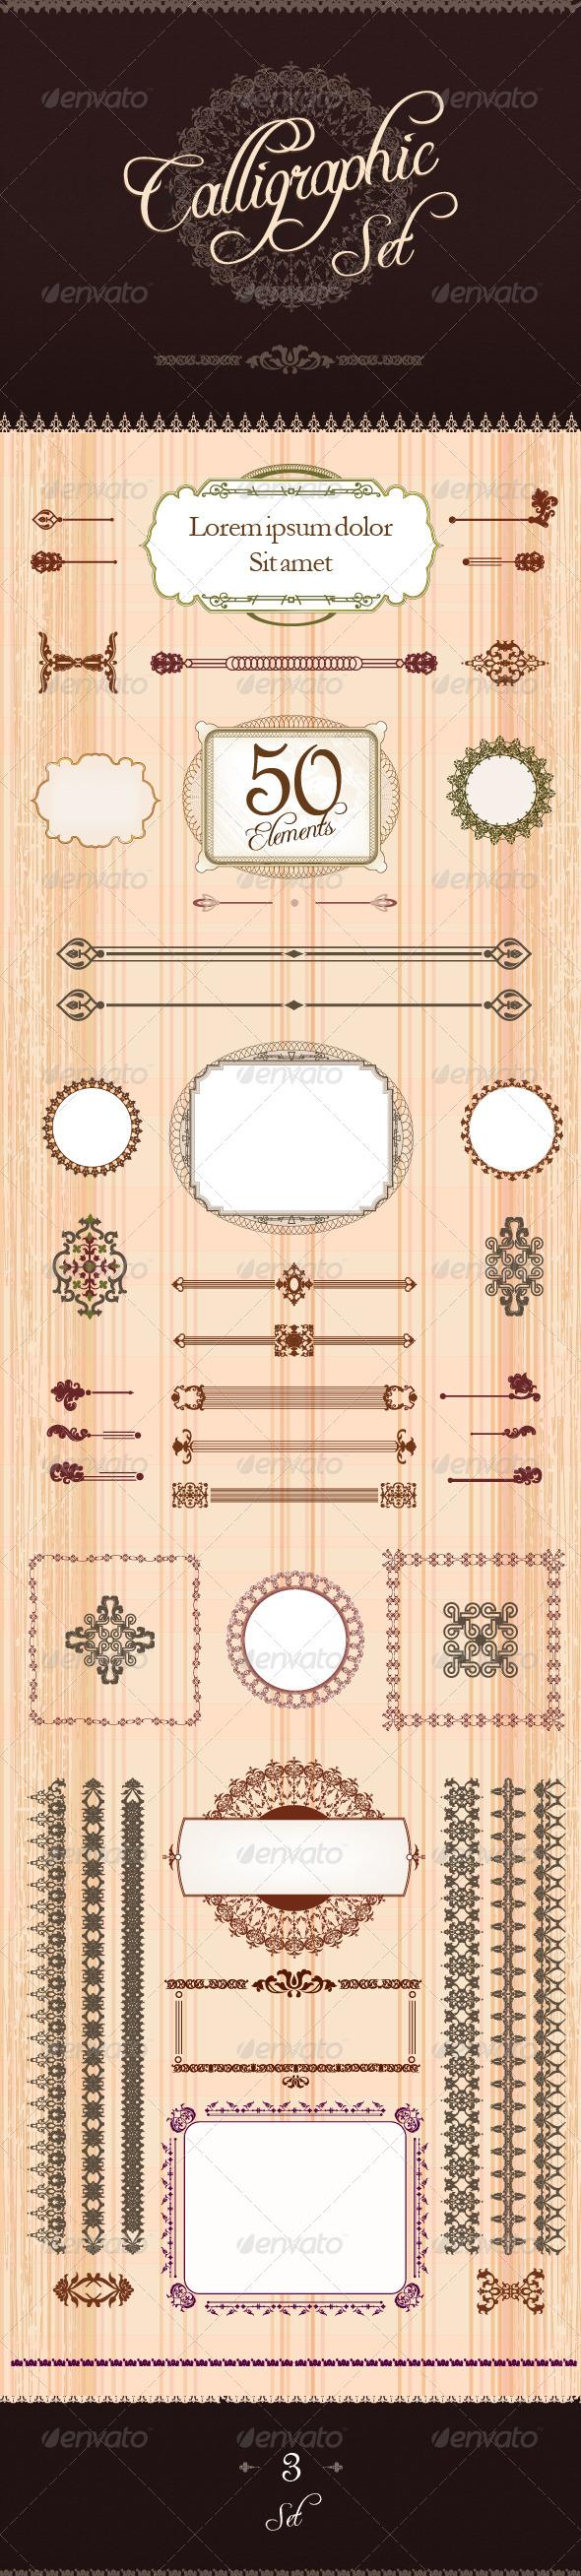 GraphicRiver Calligraphic Design Set 3 4245101